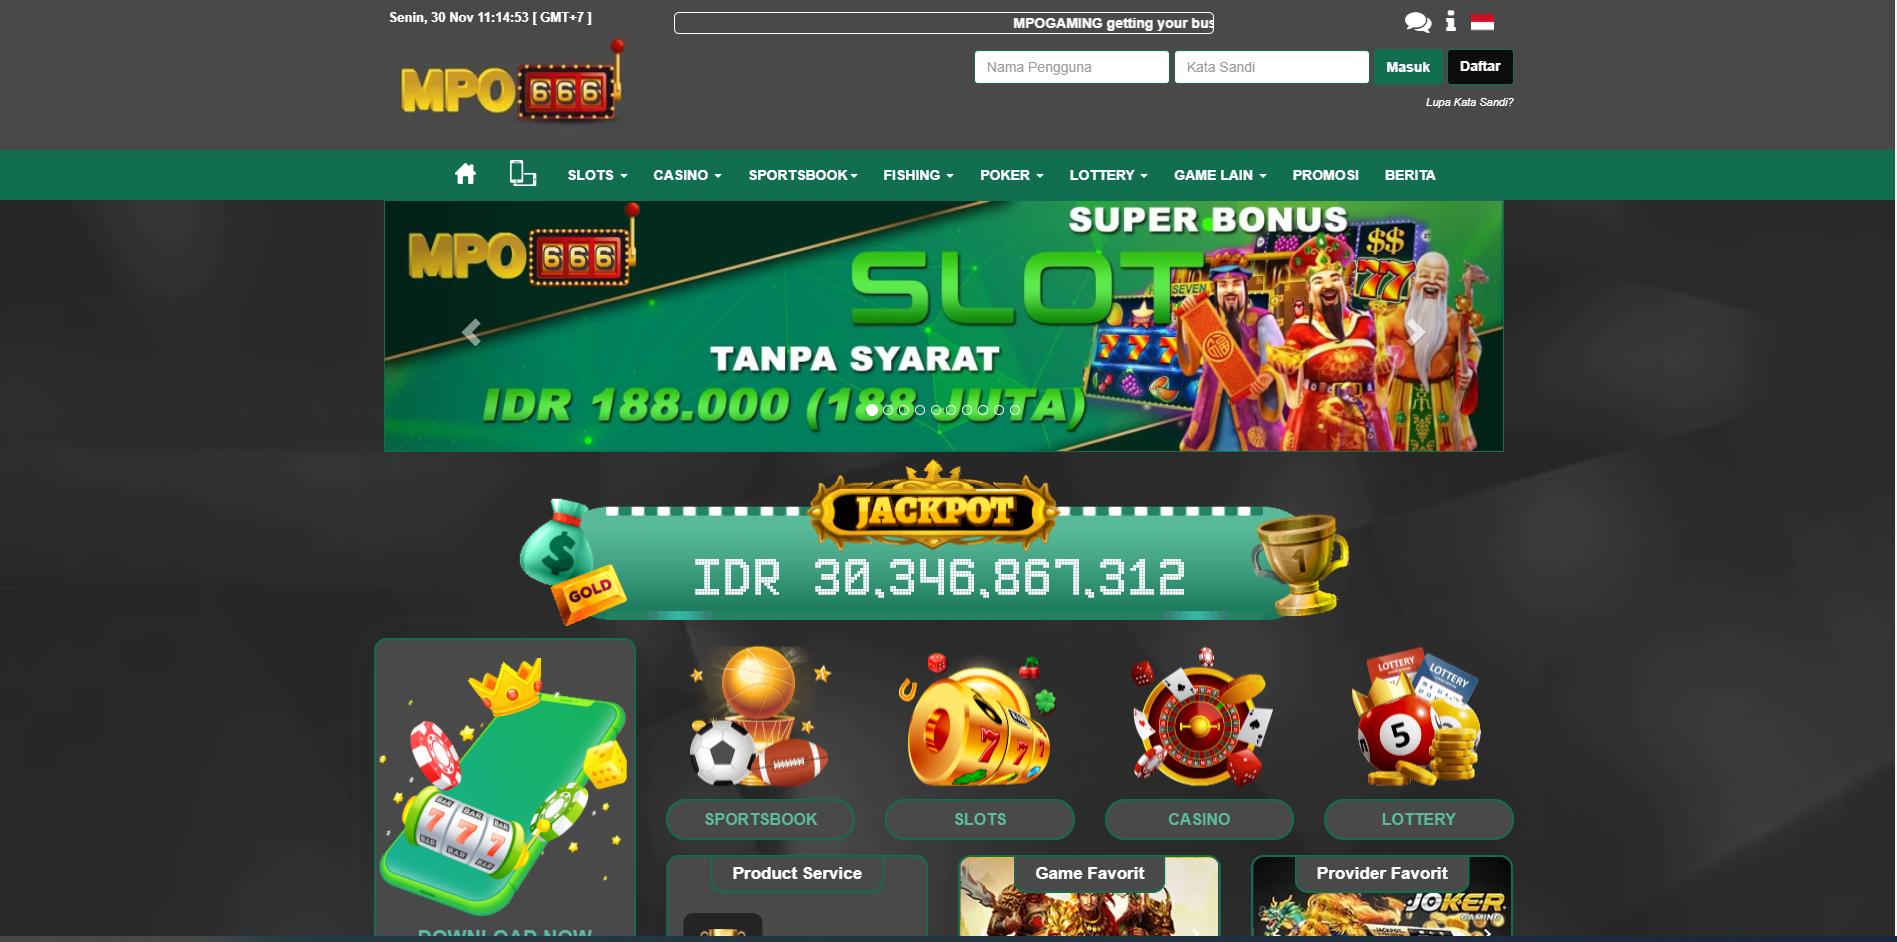 Mpo666 Situs Mpo Slot Online Terbaru Terpercaya Profile Comi Baby Doll Community